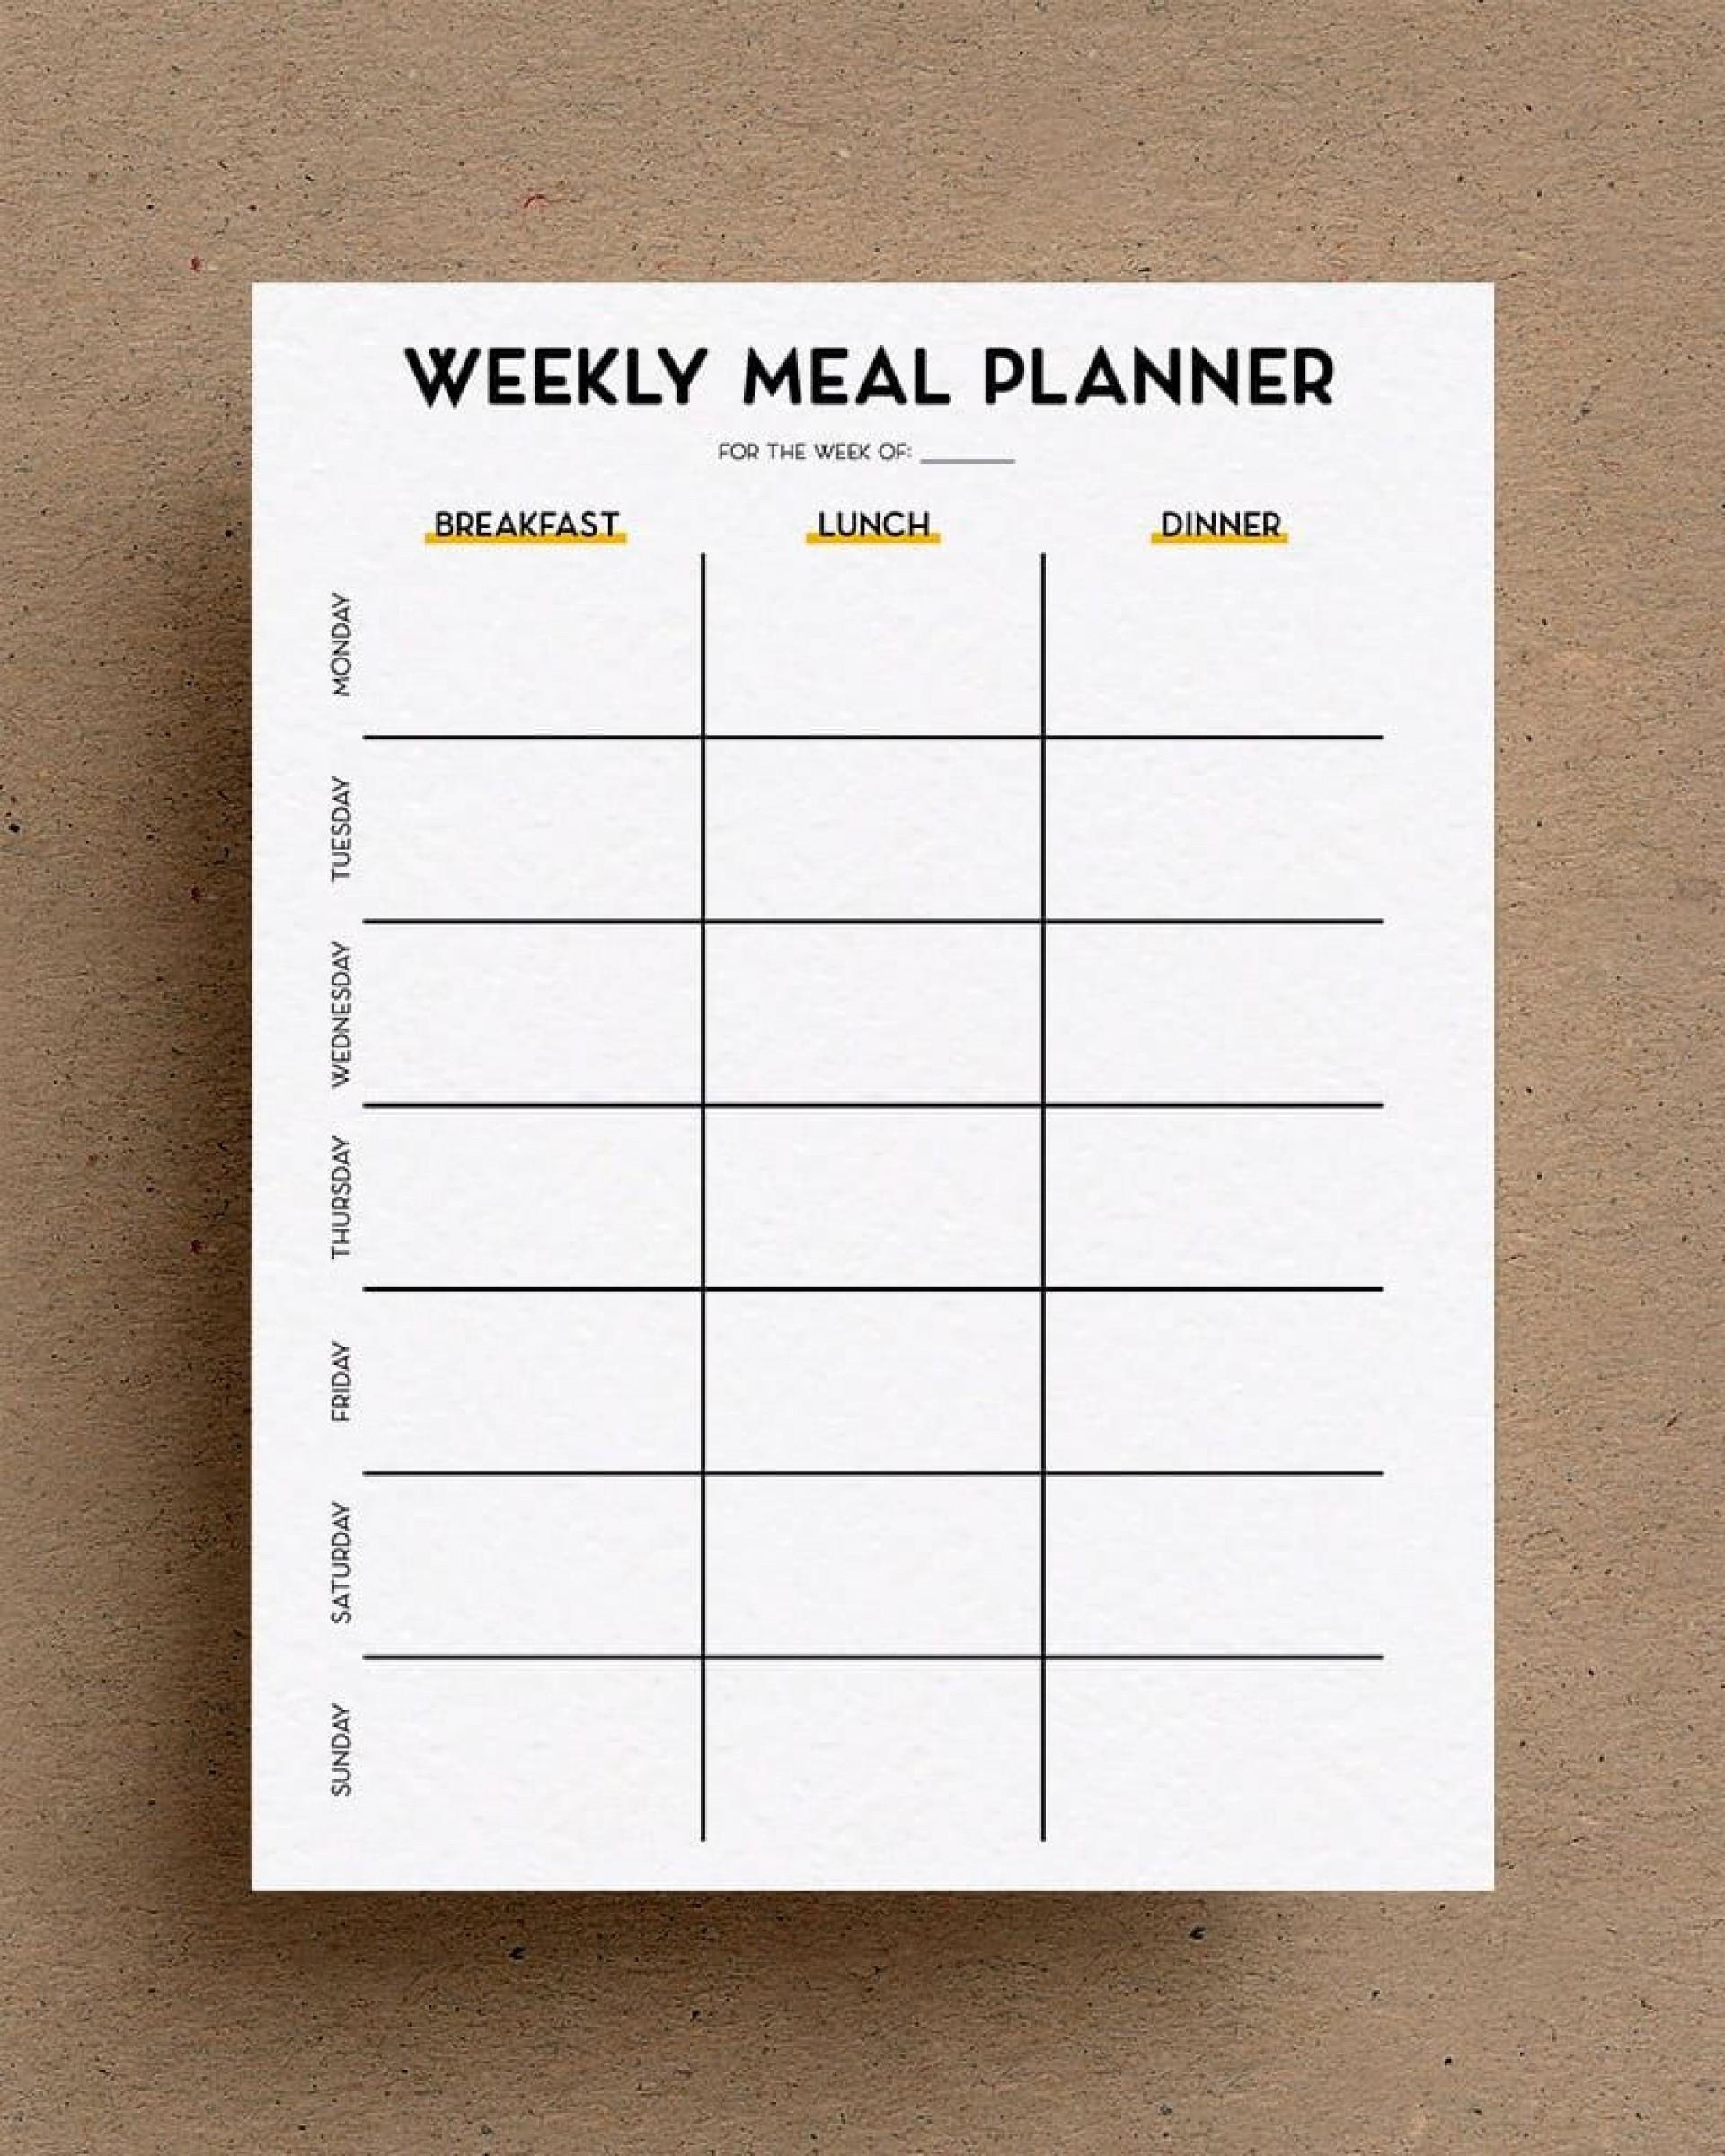 003 Excellent Eating Plan Template Pdf High Definition  Food Safety Sample Keto Meal Gestational Diabete1920